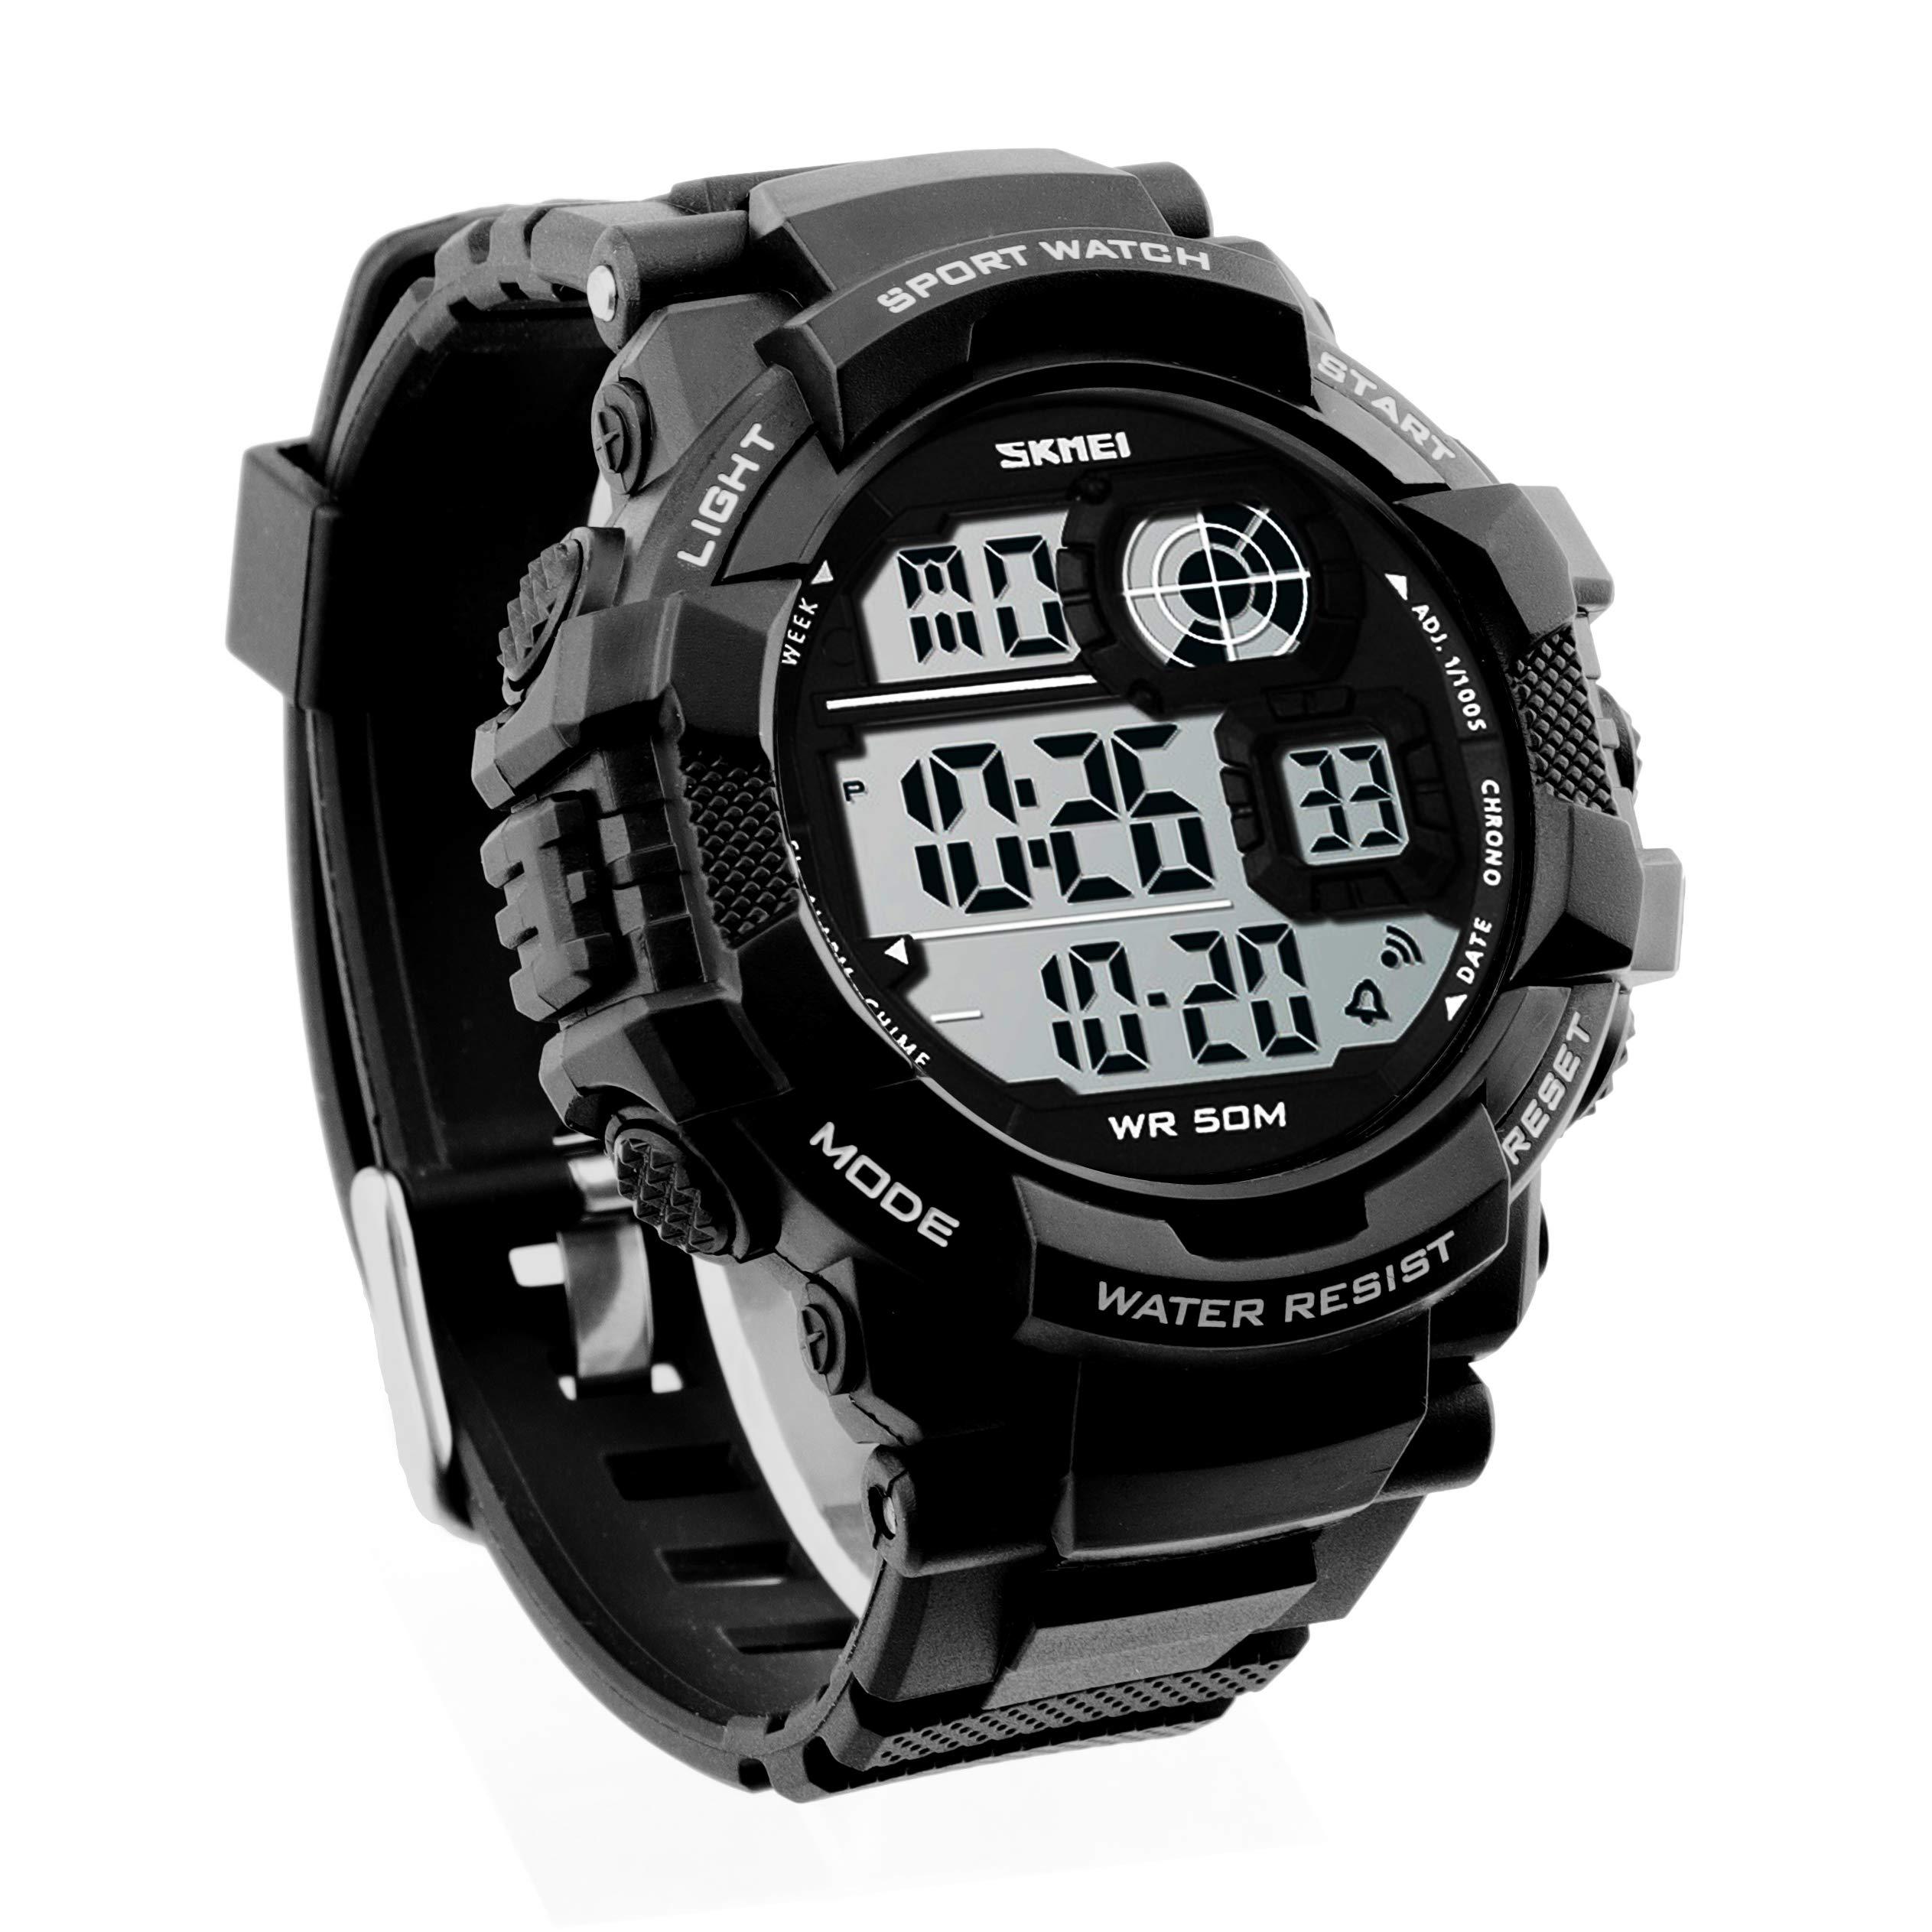 JOYSAE Men's Sport Wrist Watches, Waterproof Digital Wrist Watch with Calendar Stopwatch Alarm- Color Black